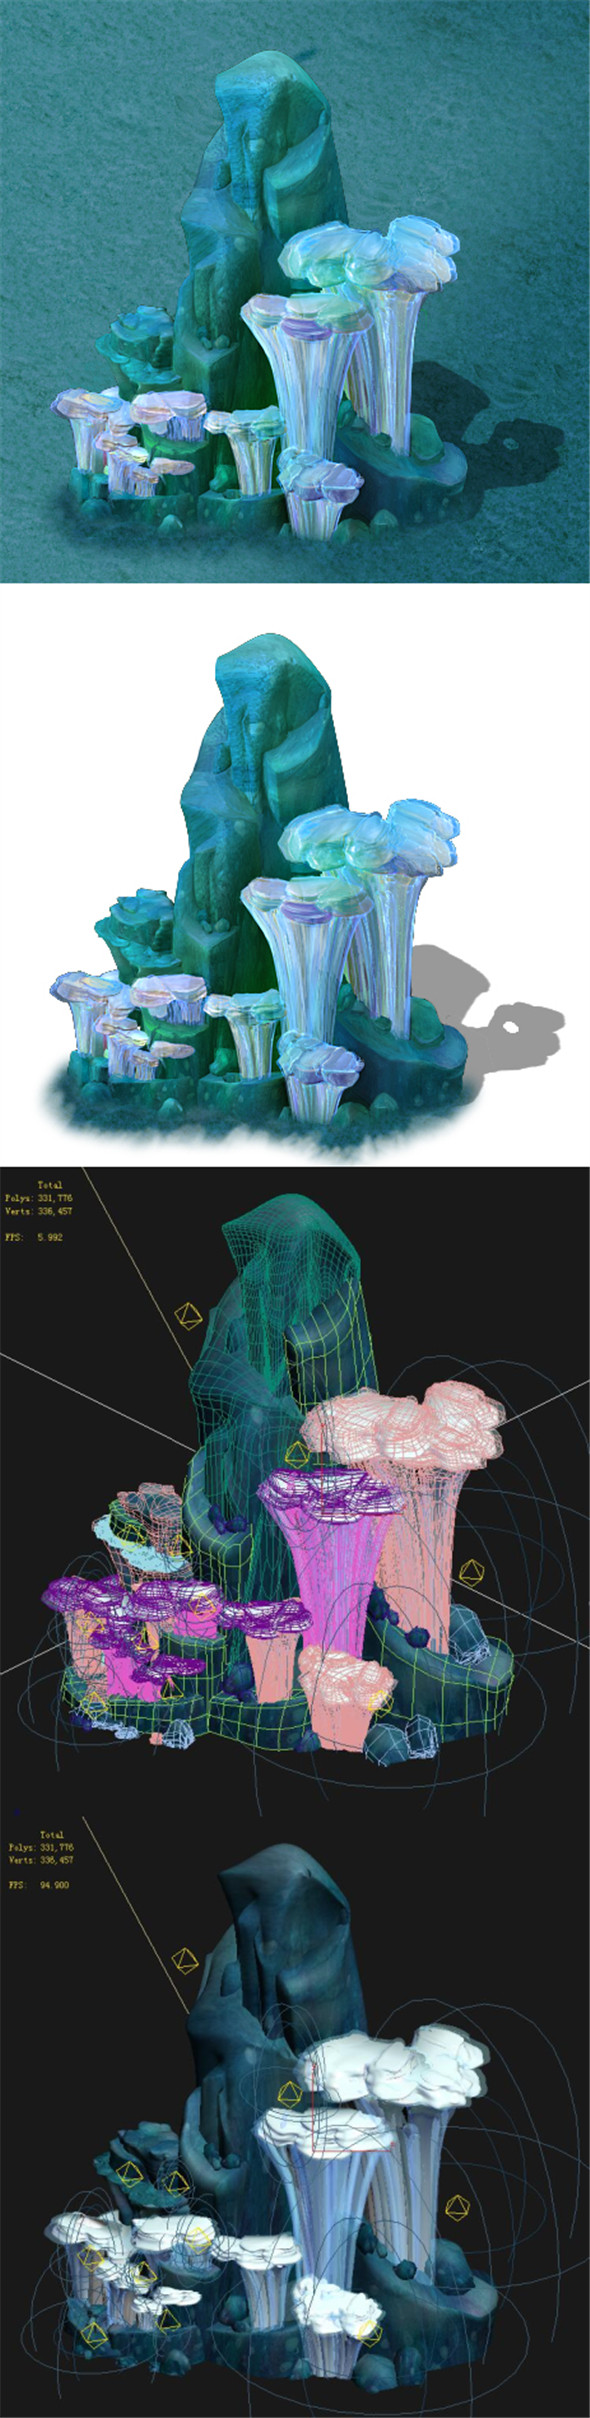 Submarine Cartoon World - Coralstone 02 - 3DOcean Item for Sale